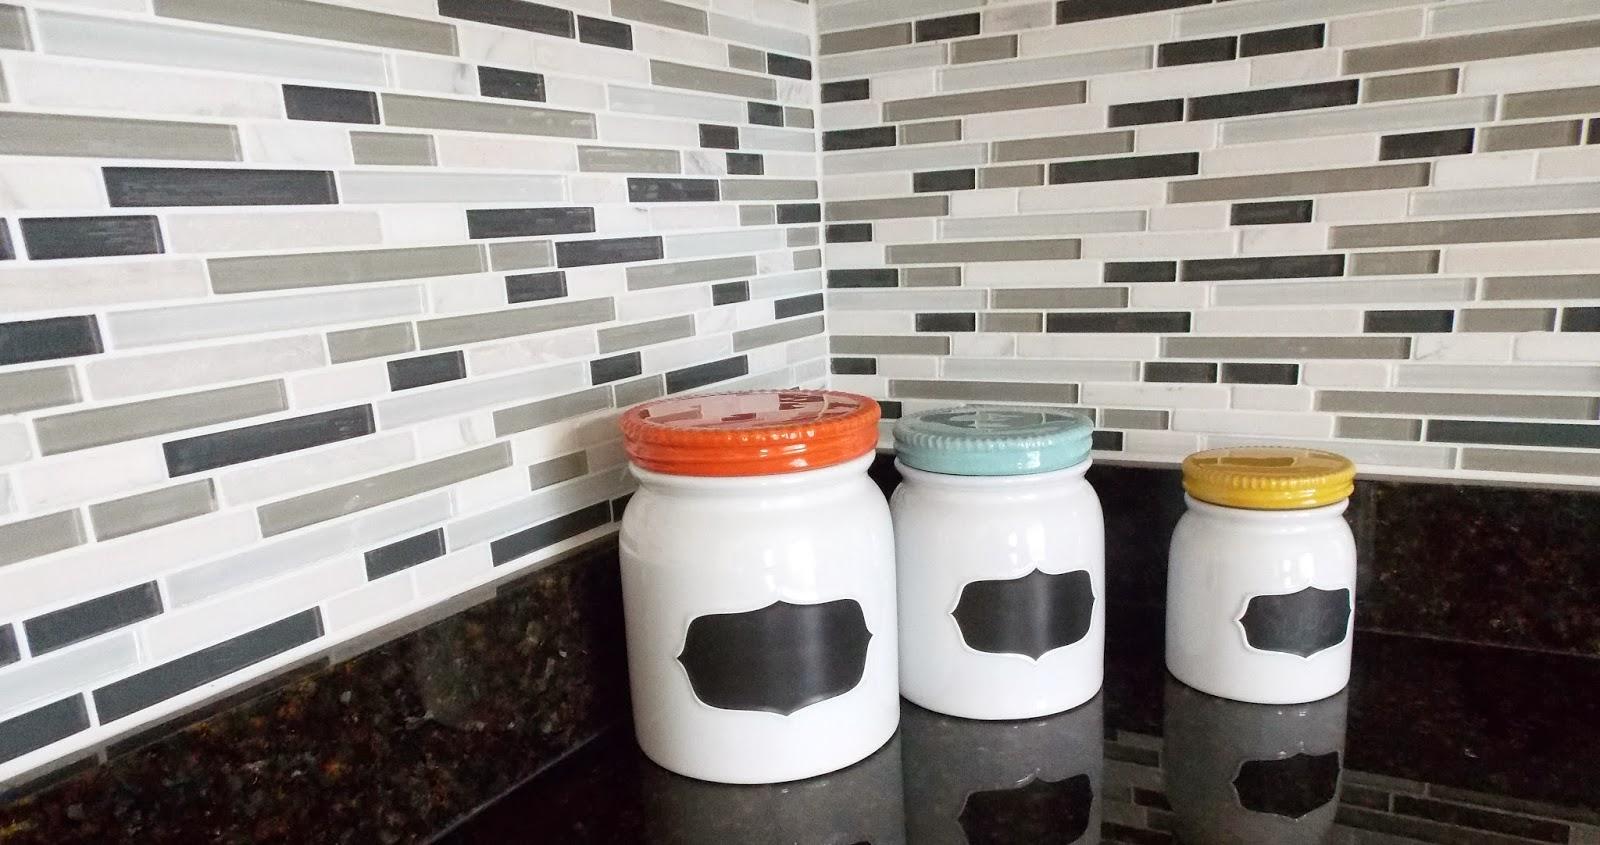 Lowe's Glass Tile Kitchen Backsplash